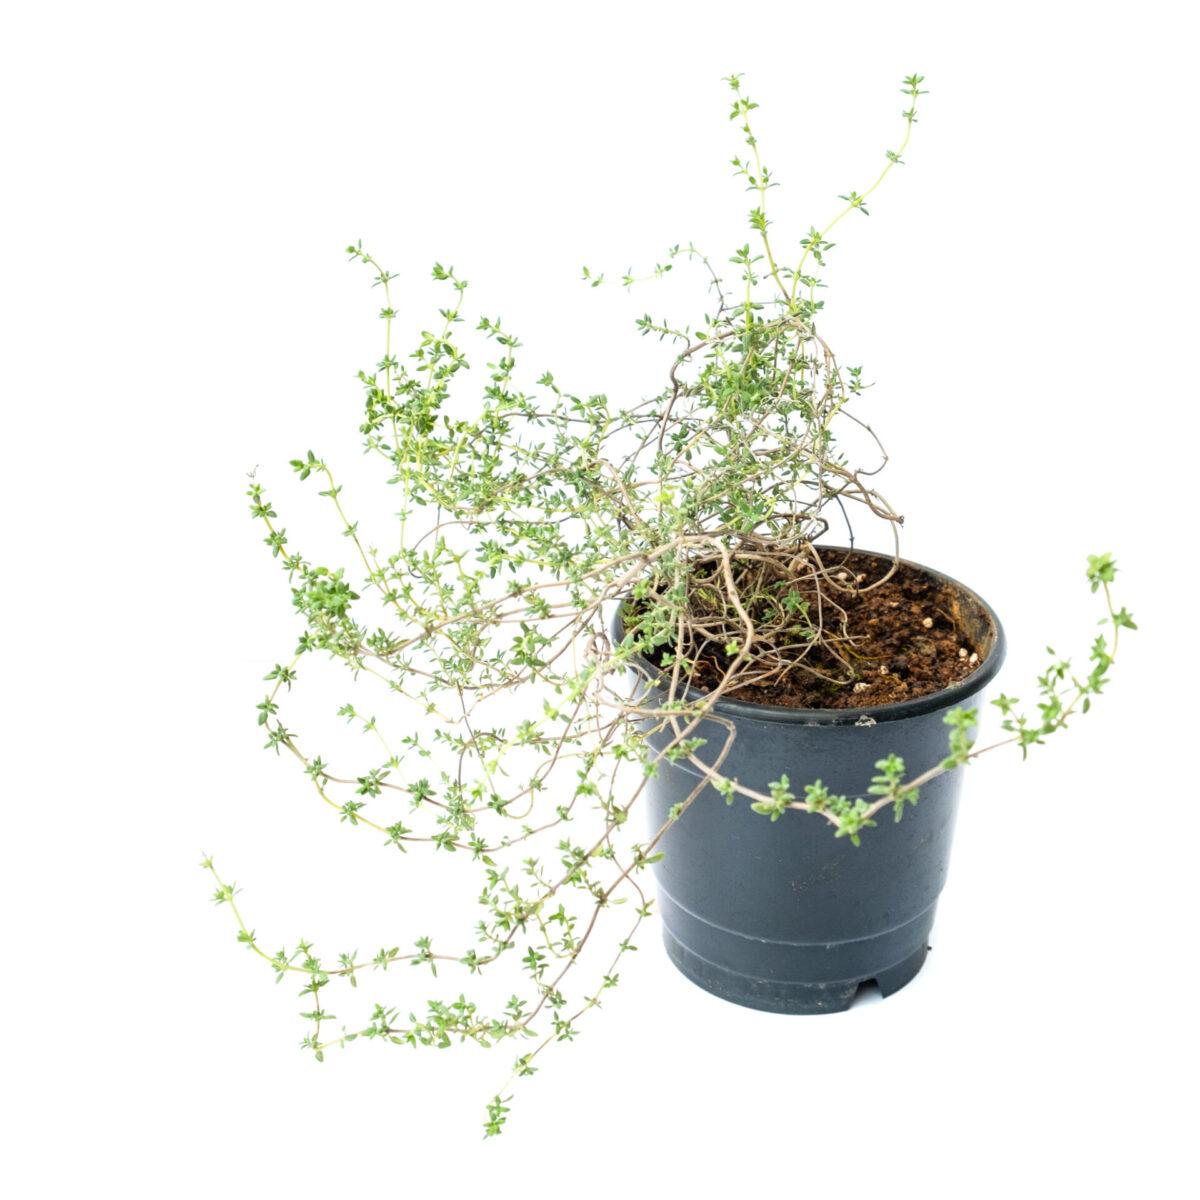 Bagh Thyme Plant